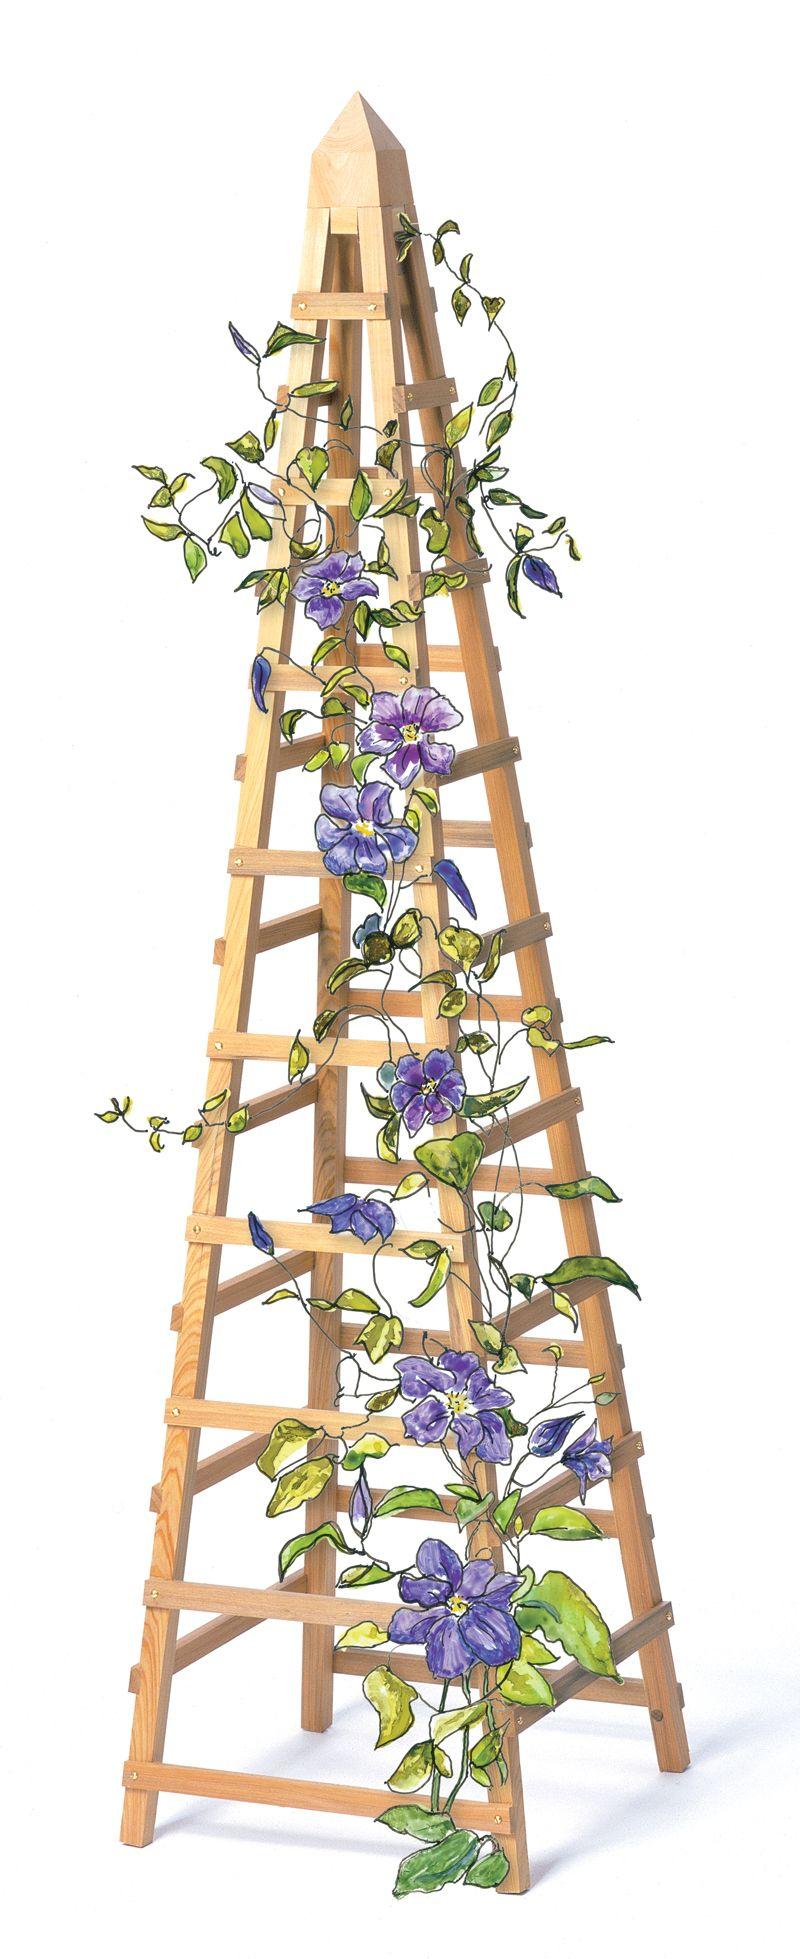 How to Build a Vine Trellis DIY Garden Trellis Plans The old